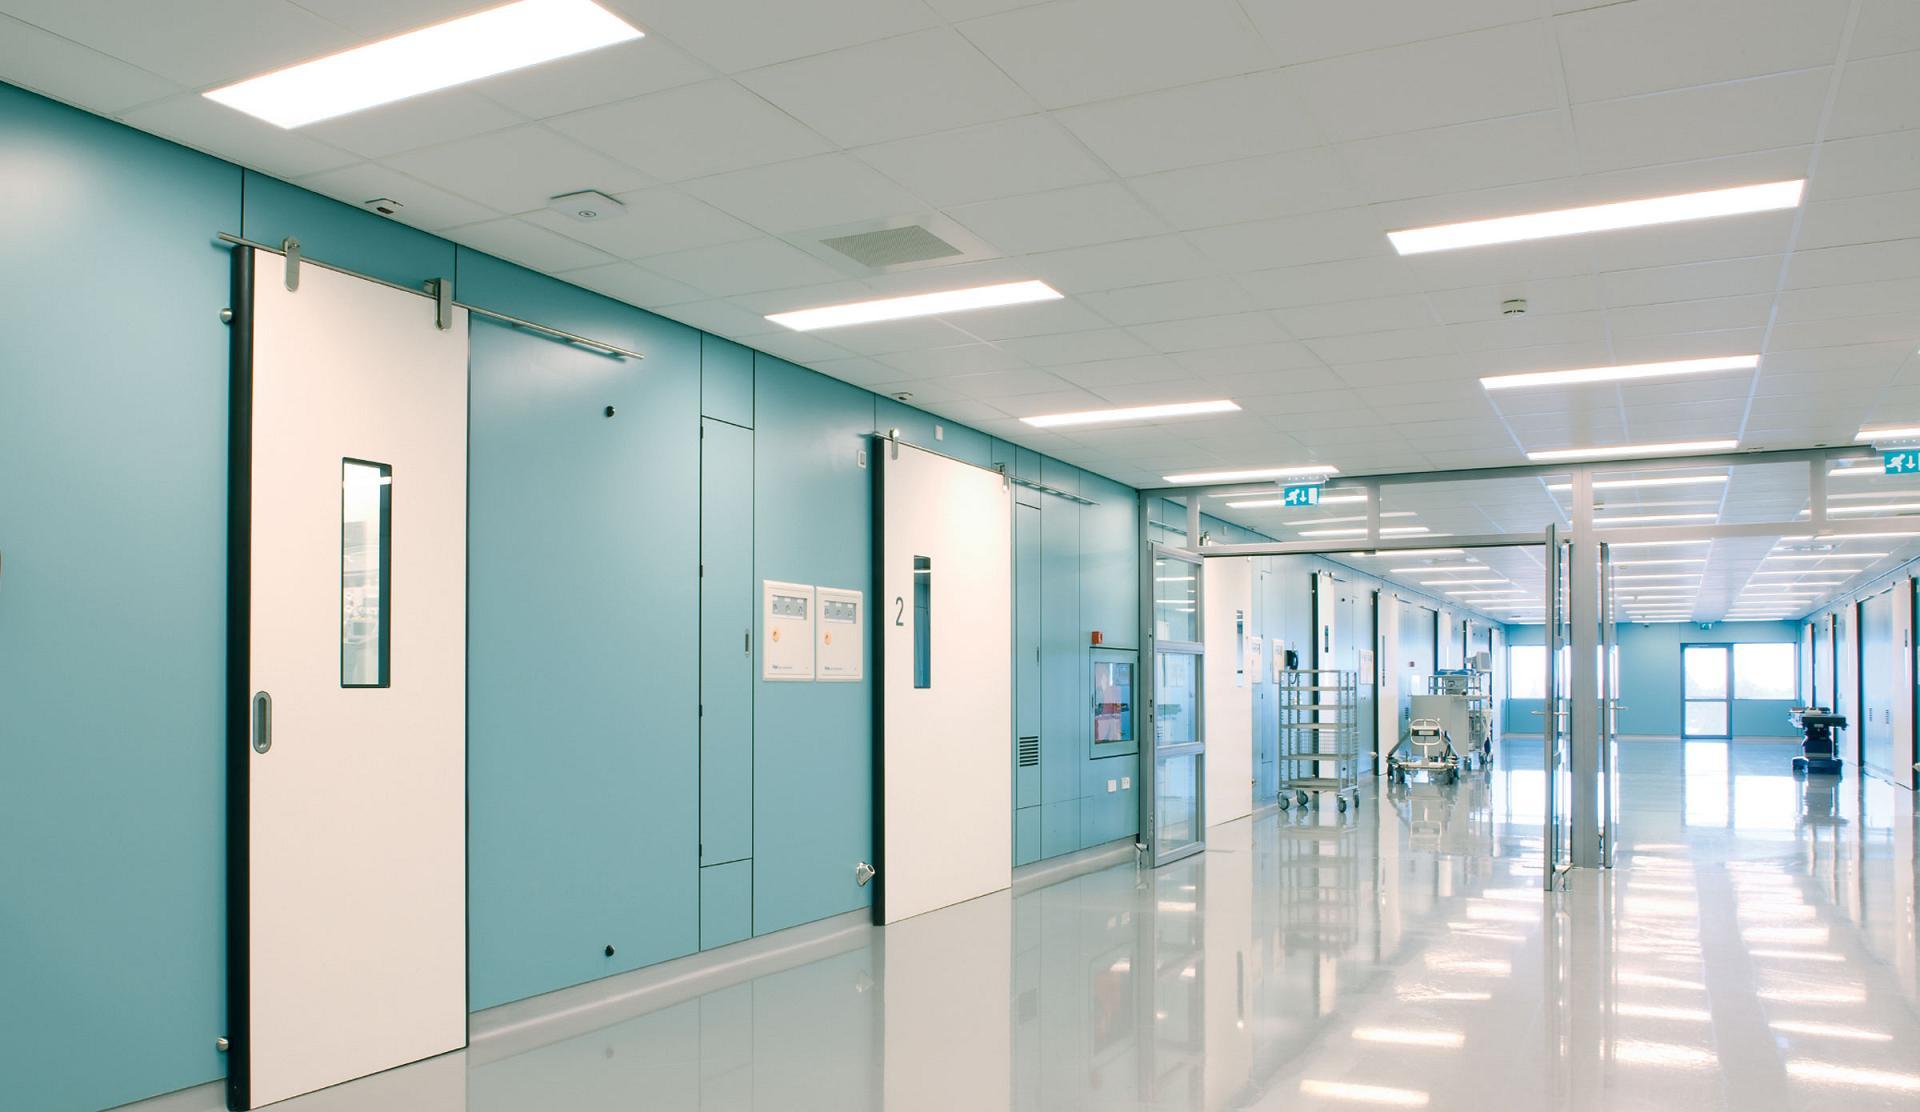 Led Utility Light >> Healthcare lighting - LED lighting for healthcare by TRILUX